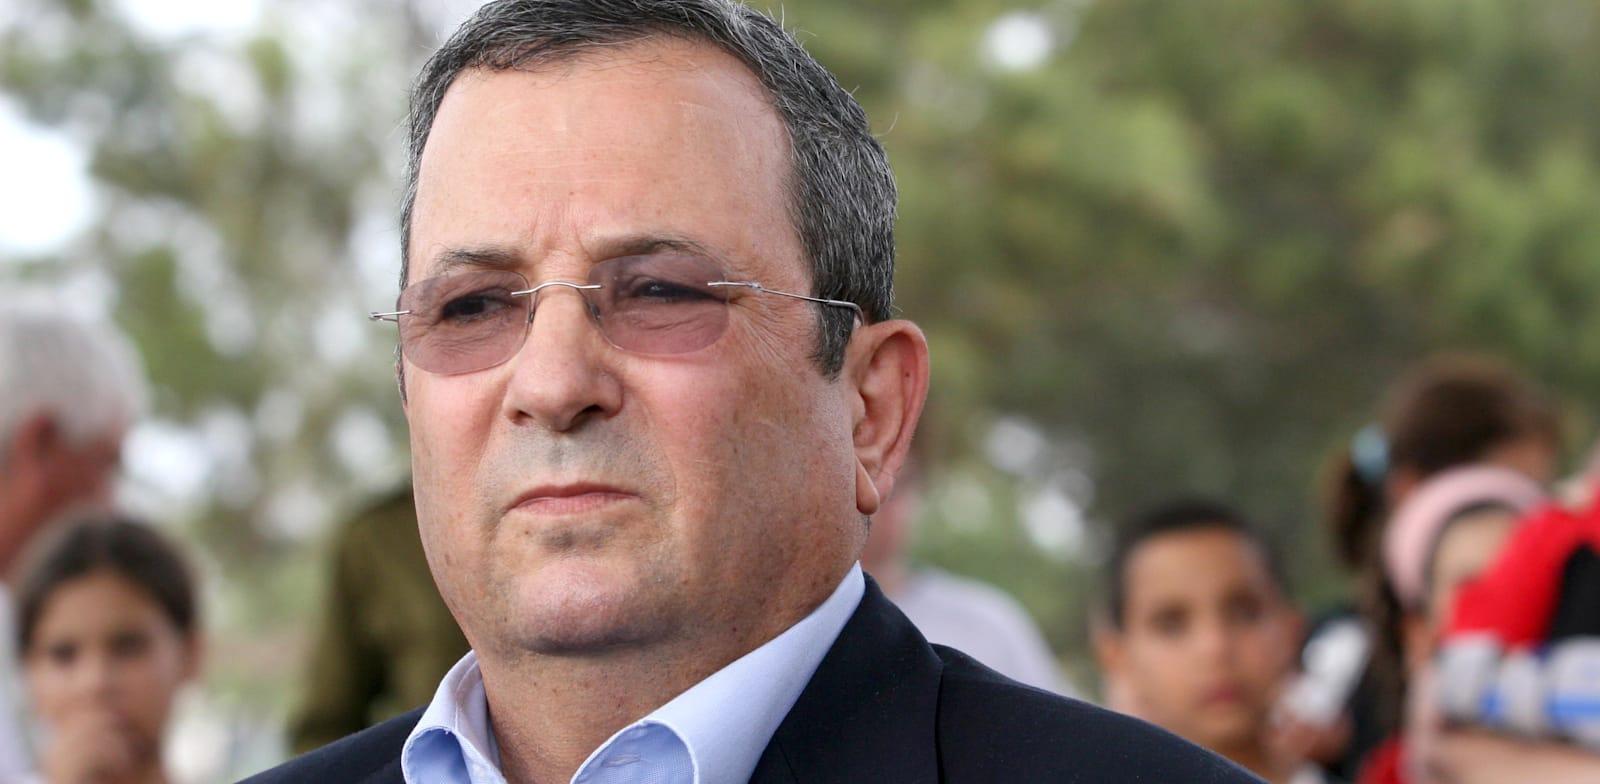 Ehud Barak credit: Dor Malka